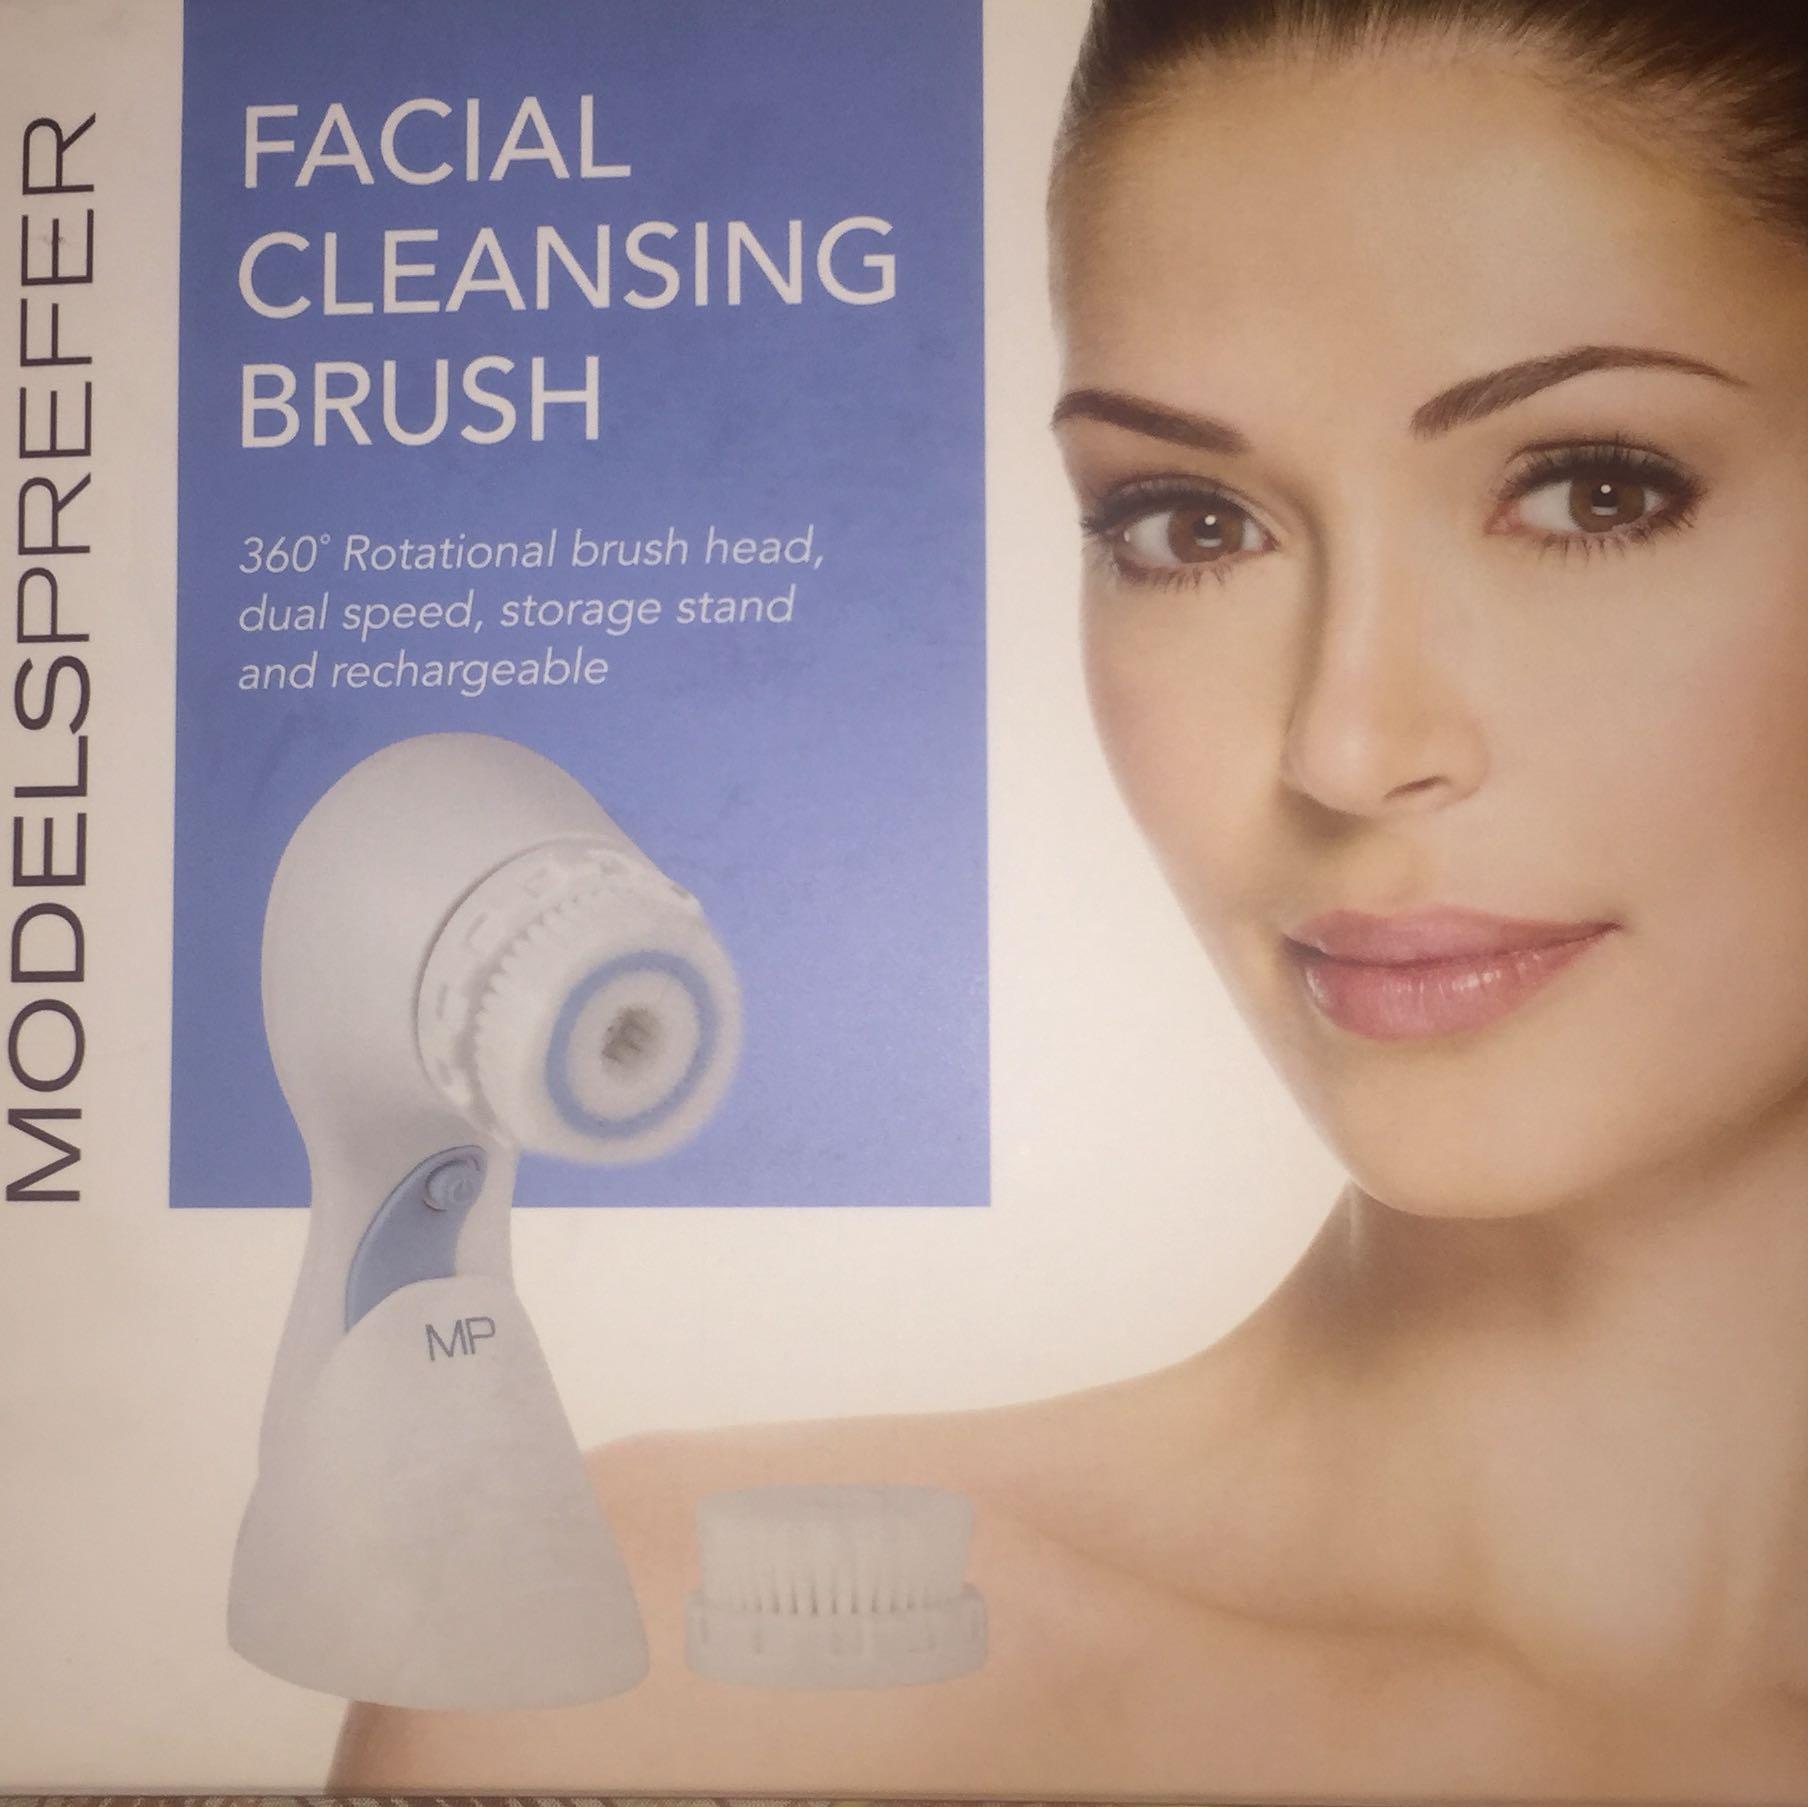 MP Facial Cleansing Brush